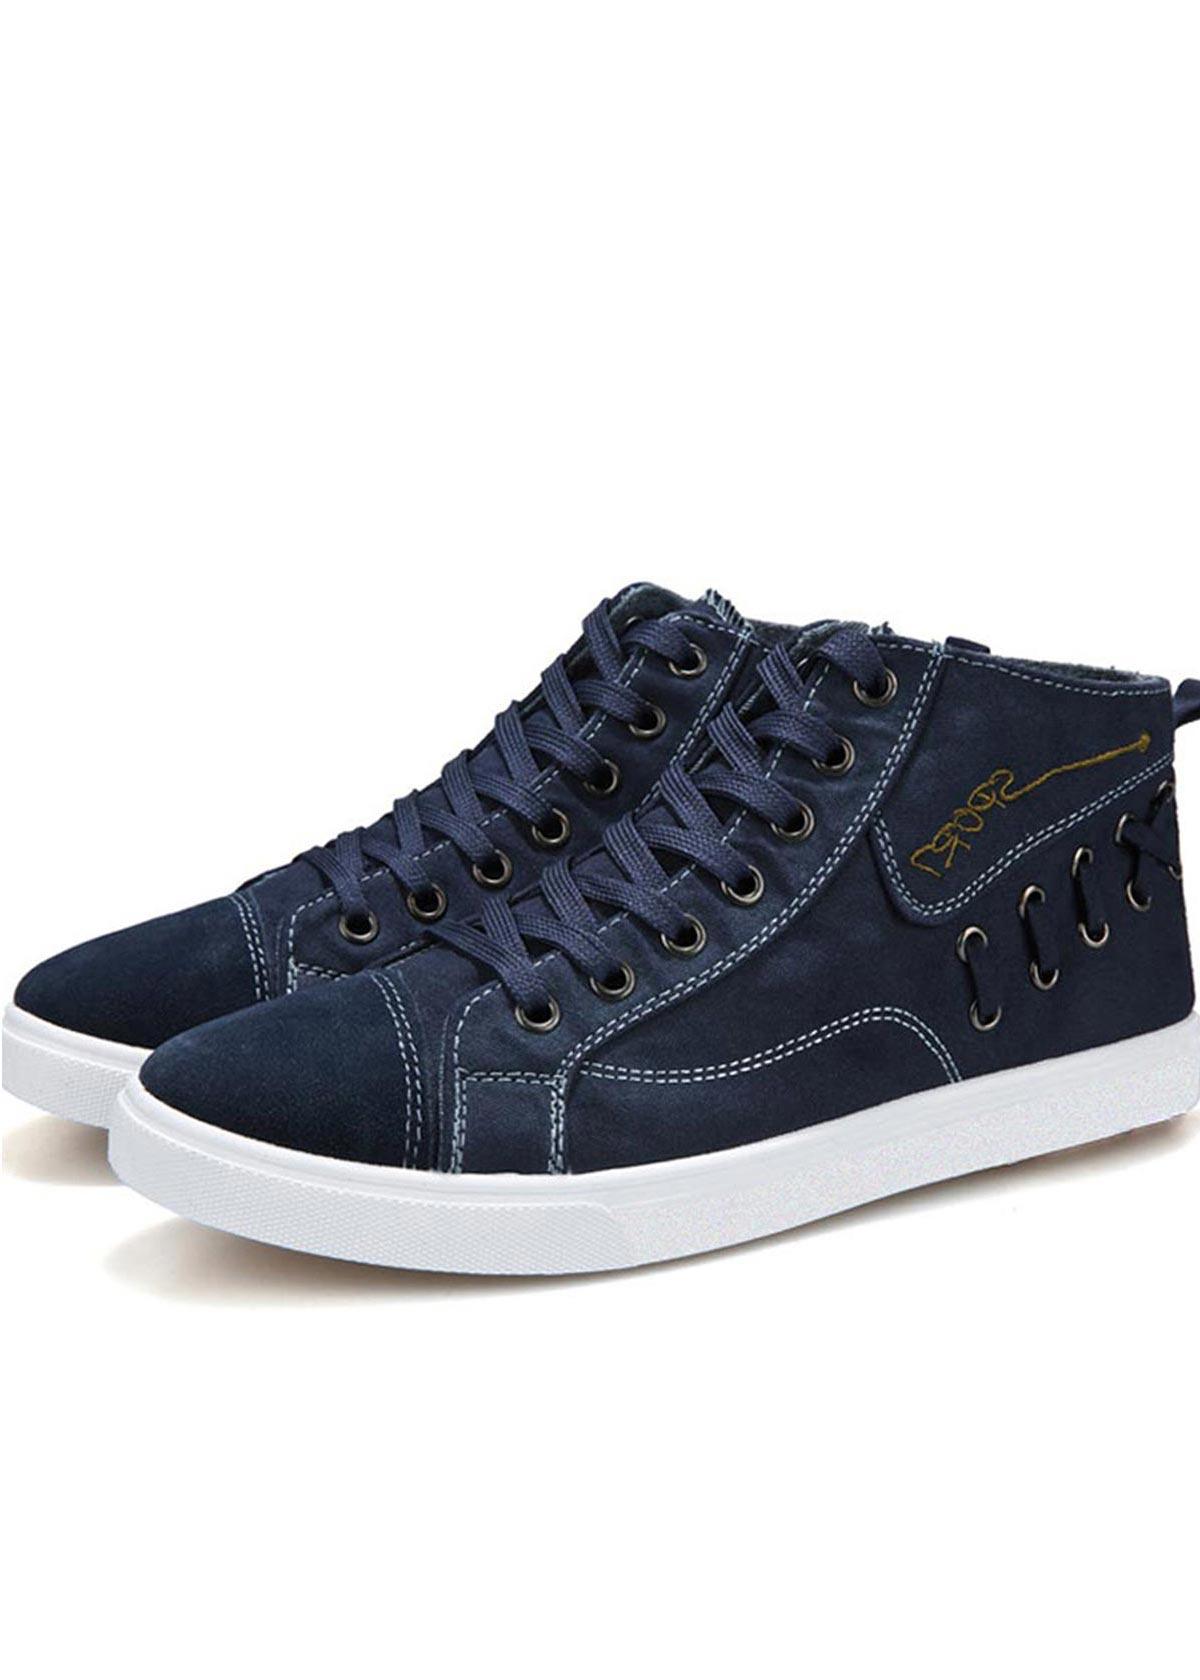 Giày nam cao cổ thời trang PETTINO - KS02